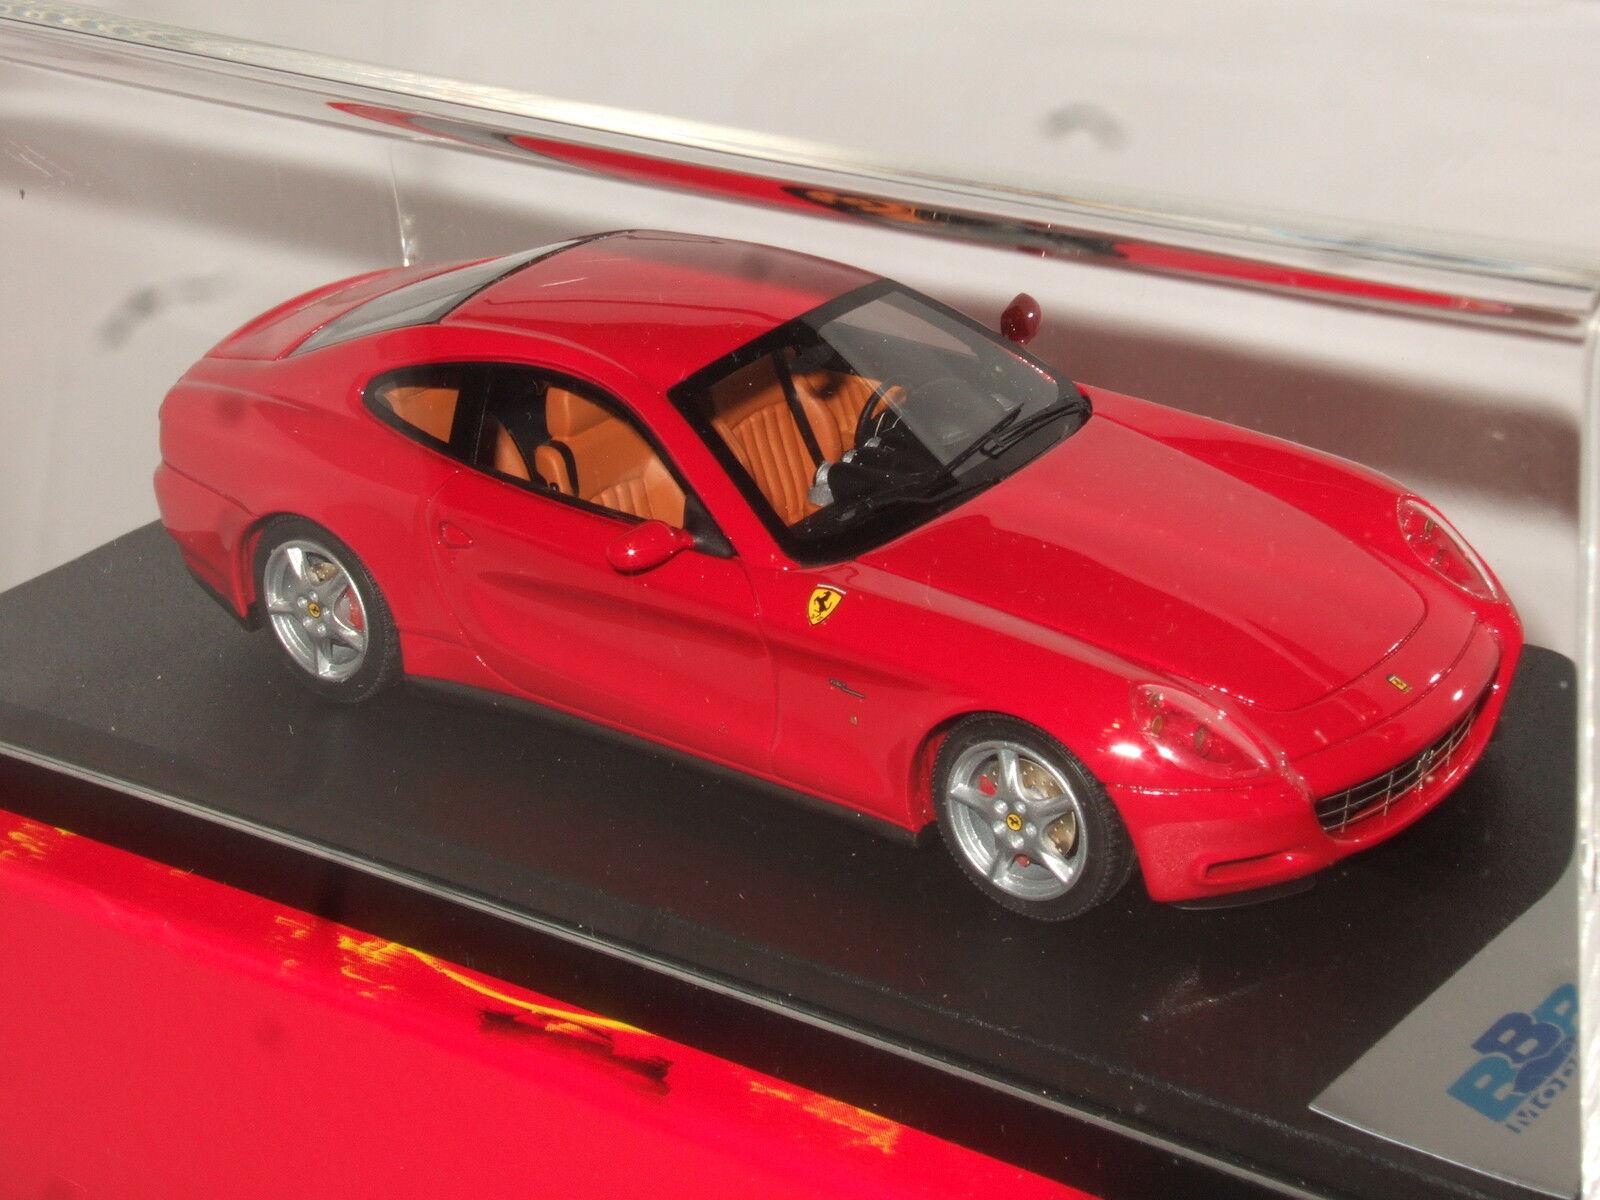 Nuevo Bbr Models bbr156d 2003 Ferrari 612 Scaglietti Street en 1 43 Escala